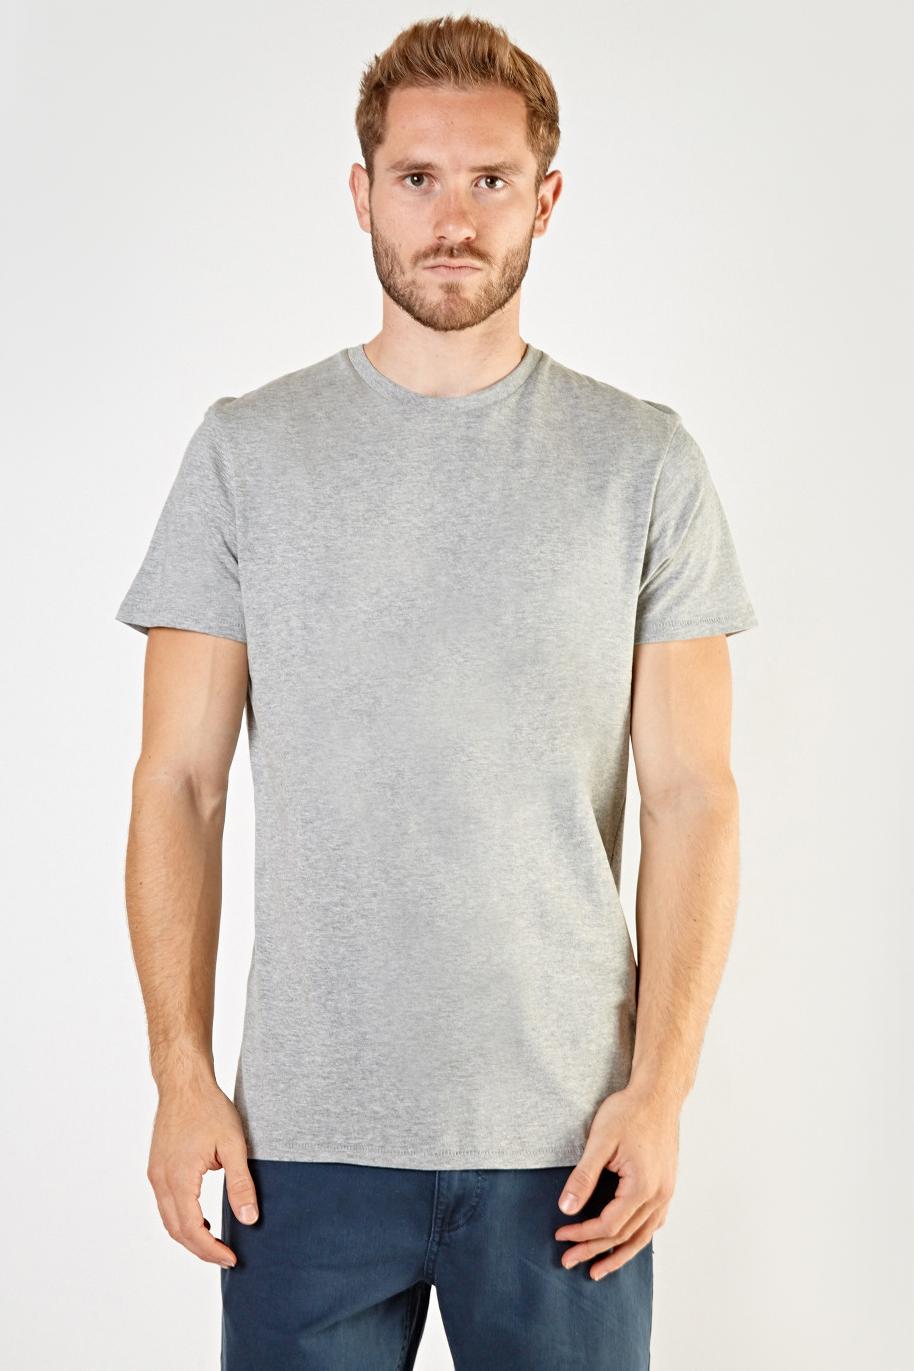 73abc03652b Short Sleeve Mens T-Shirt - Grey - Just £5